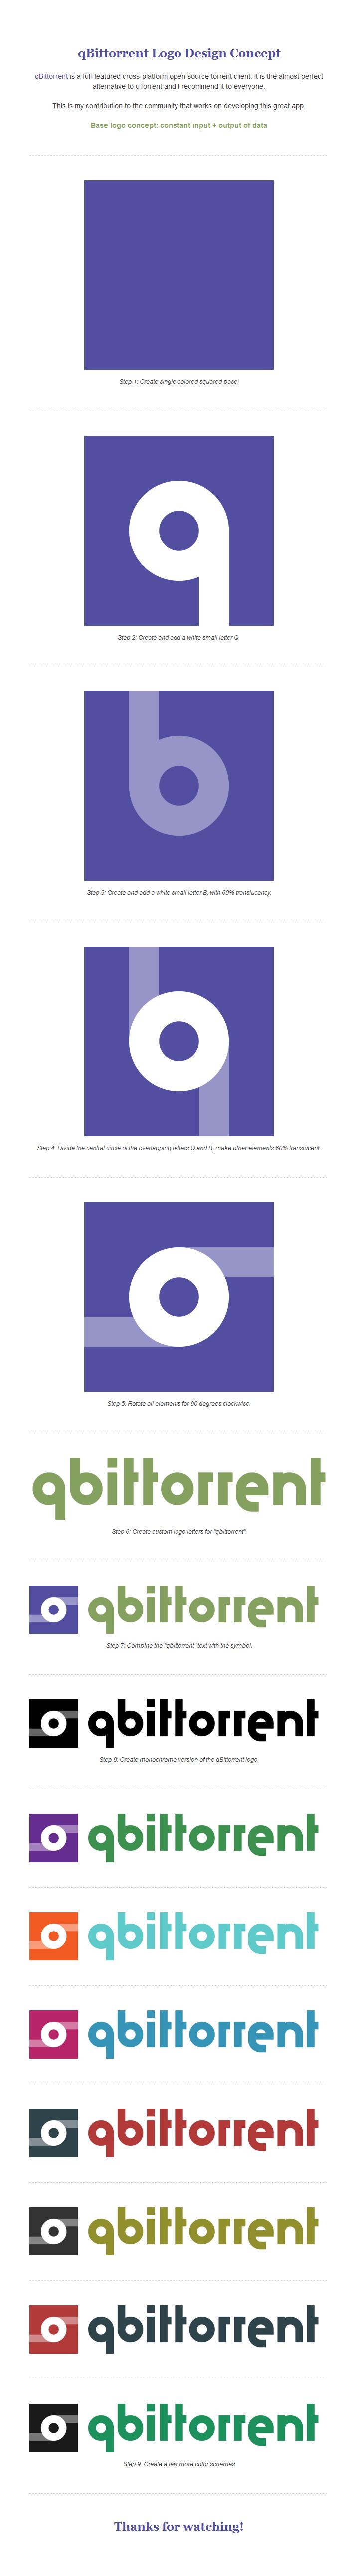 qBittorrent Logo Design Concept by monsteer